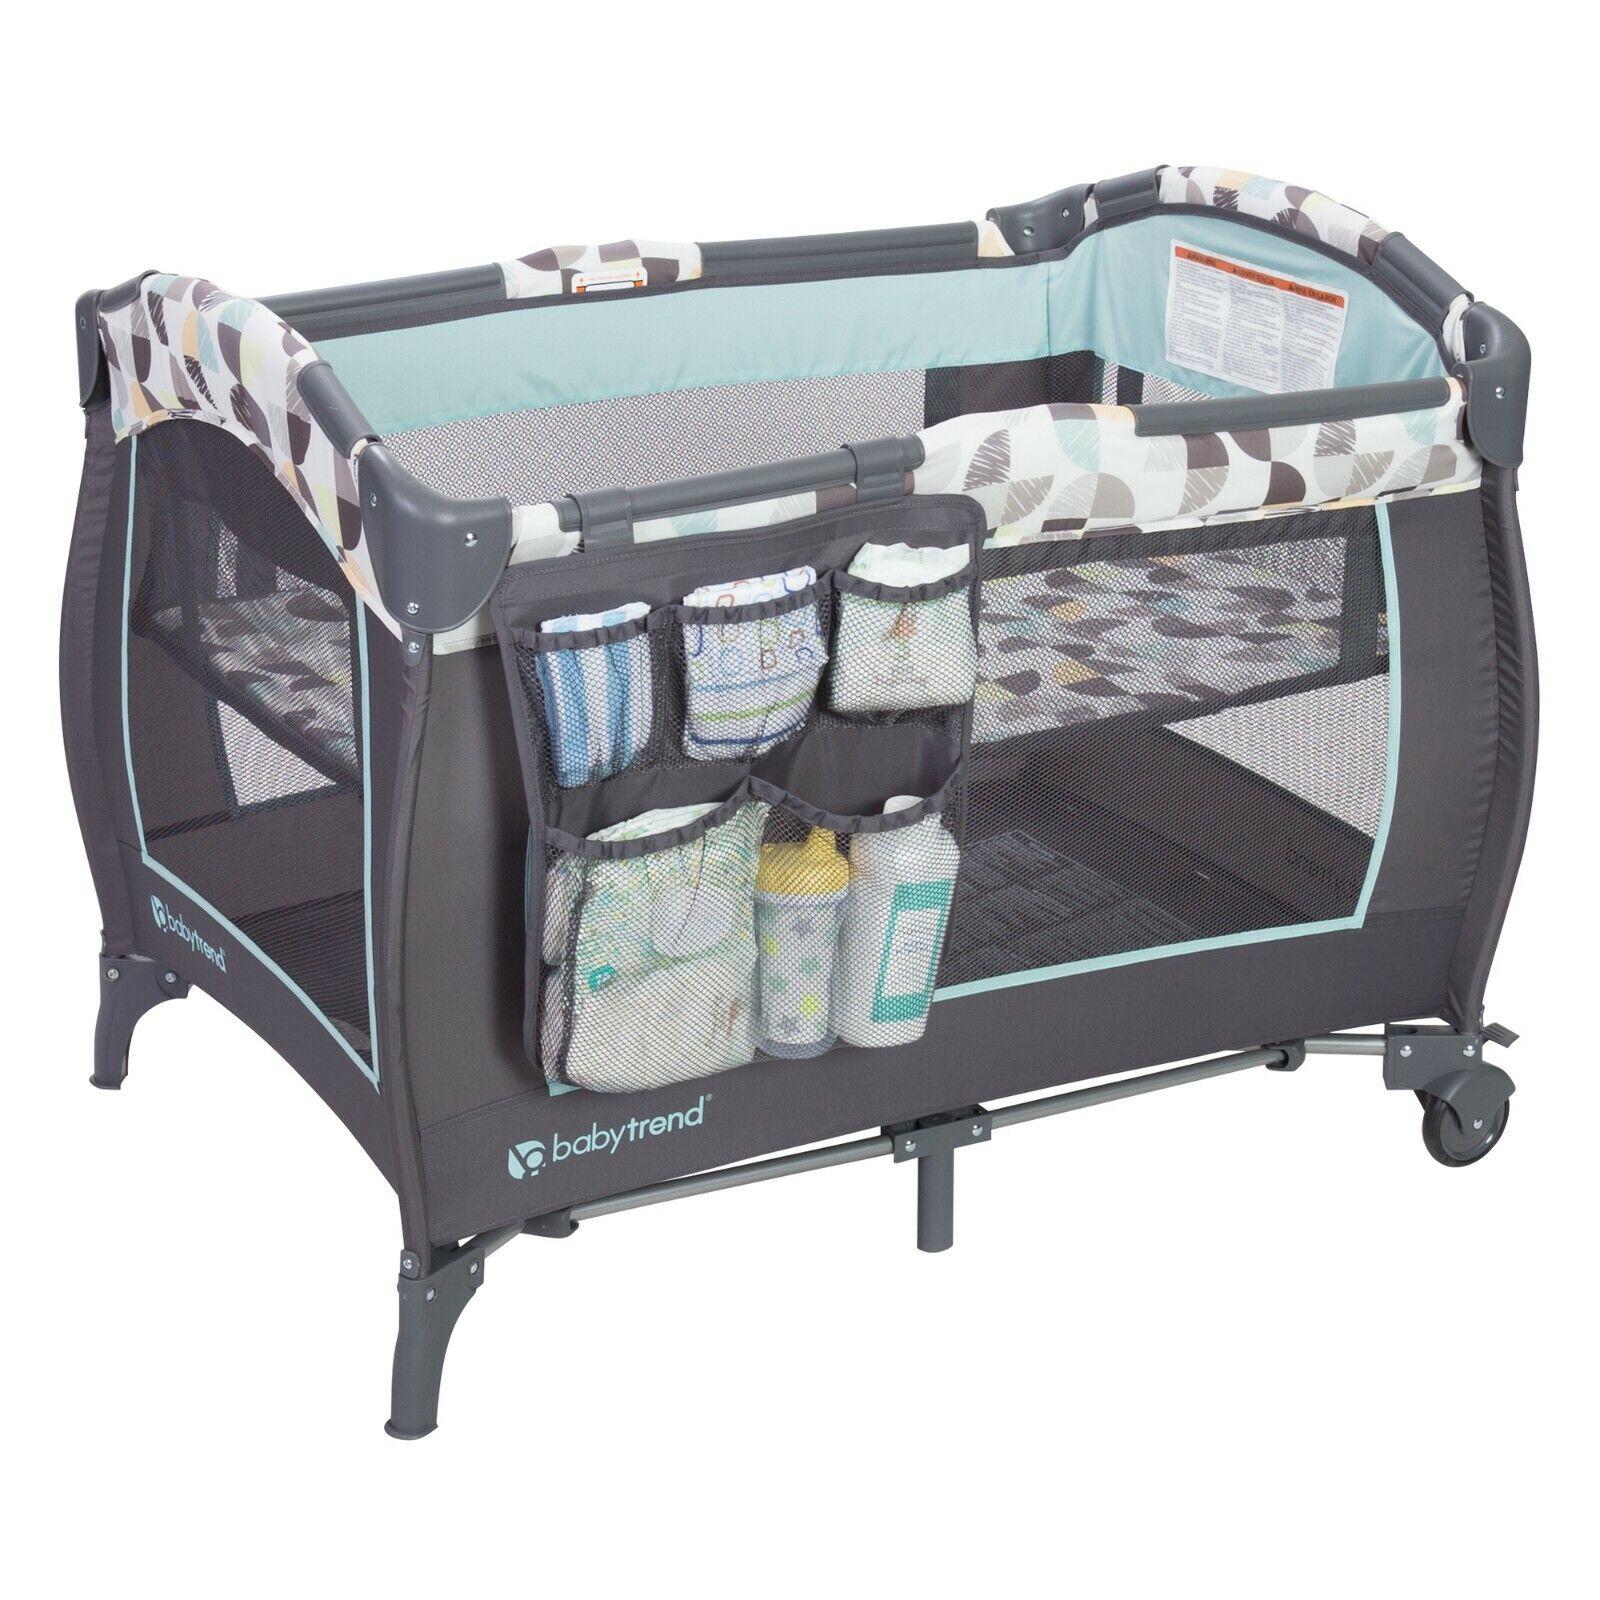 Baby Trend Trend Nursery Center Playard Bassinet Playpen Sle